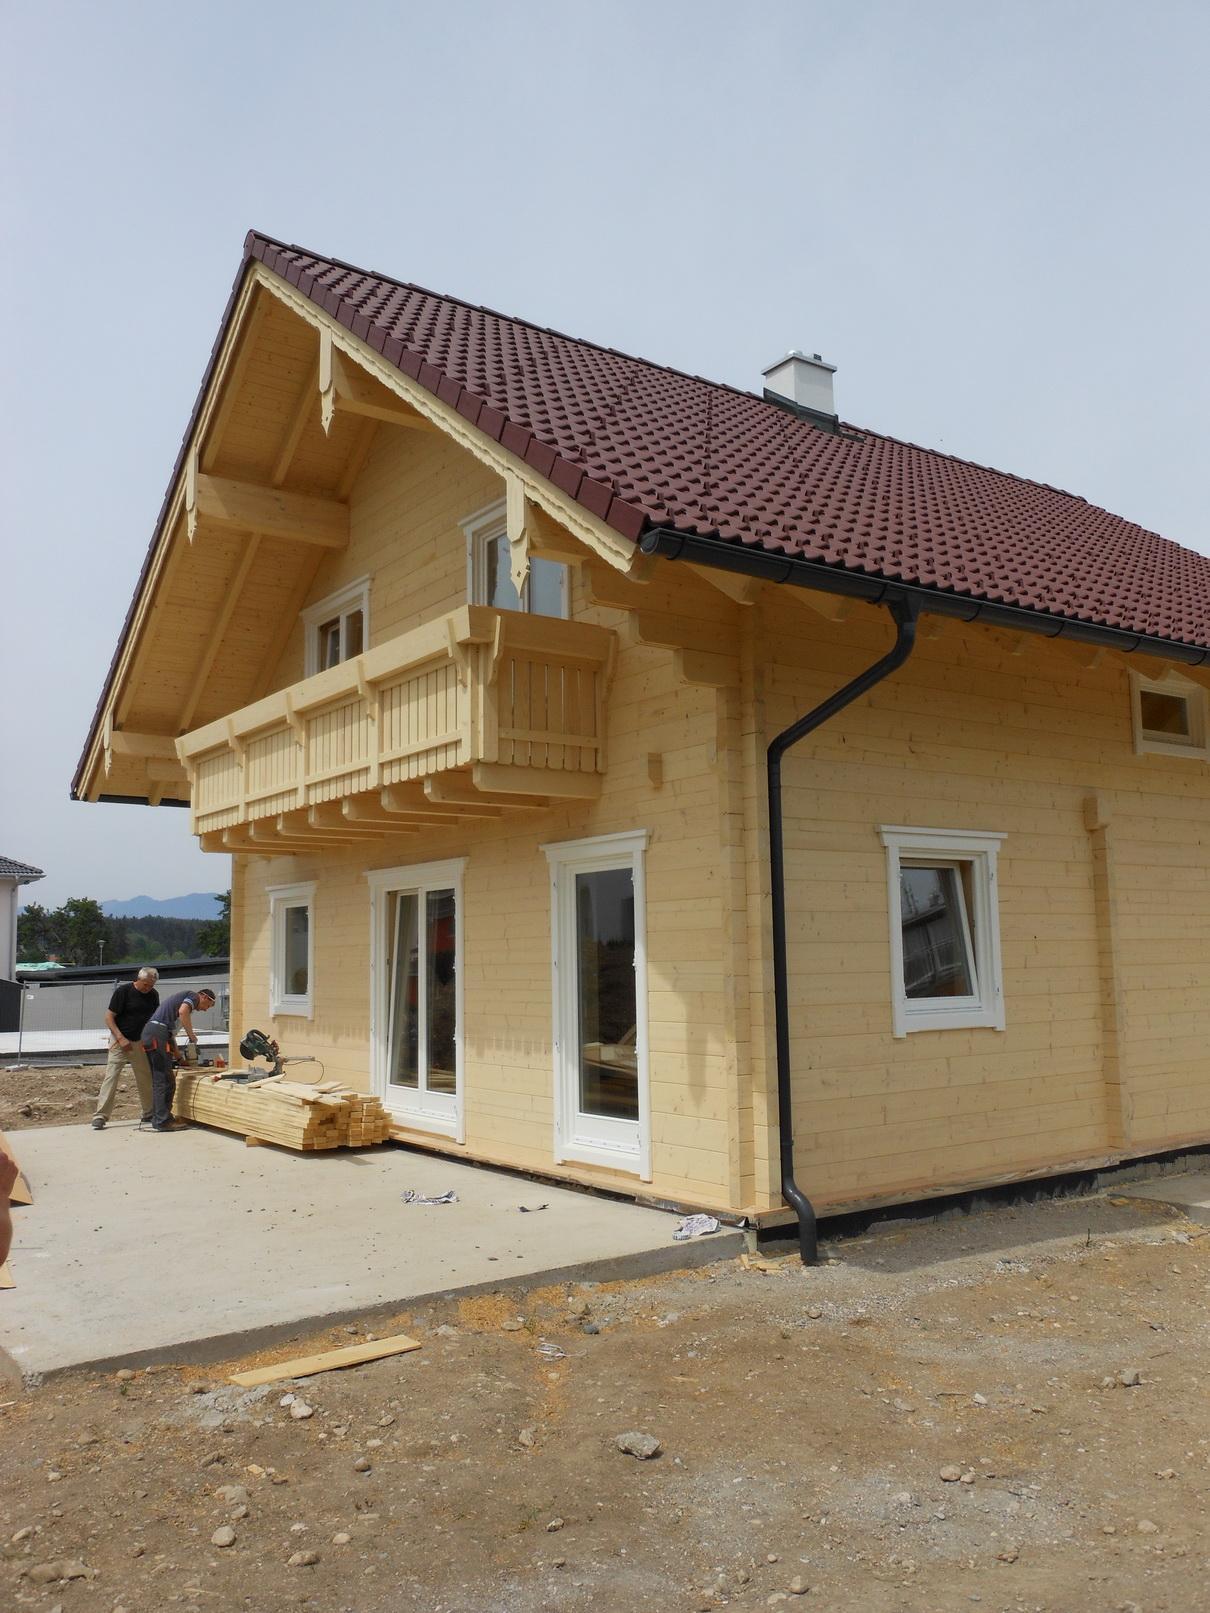 samogradnja lesene hiše